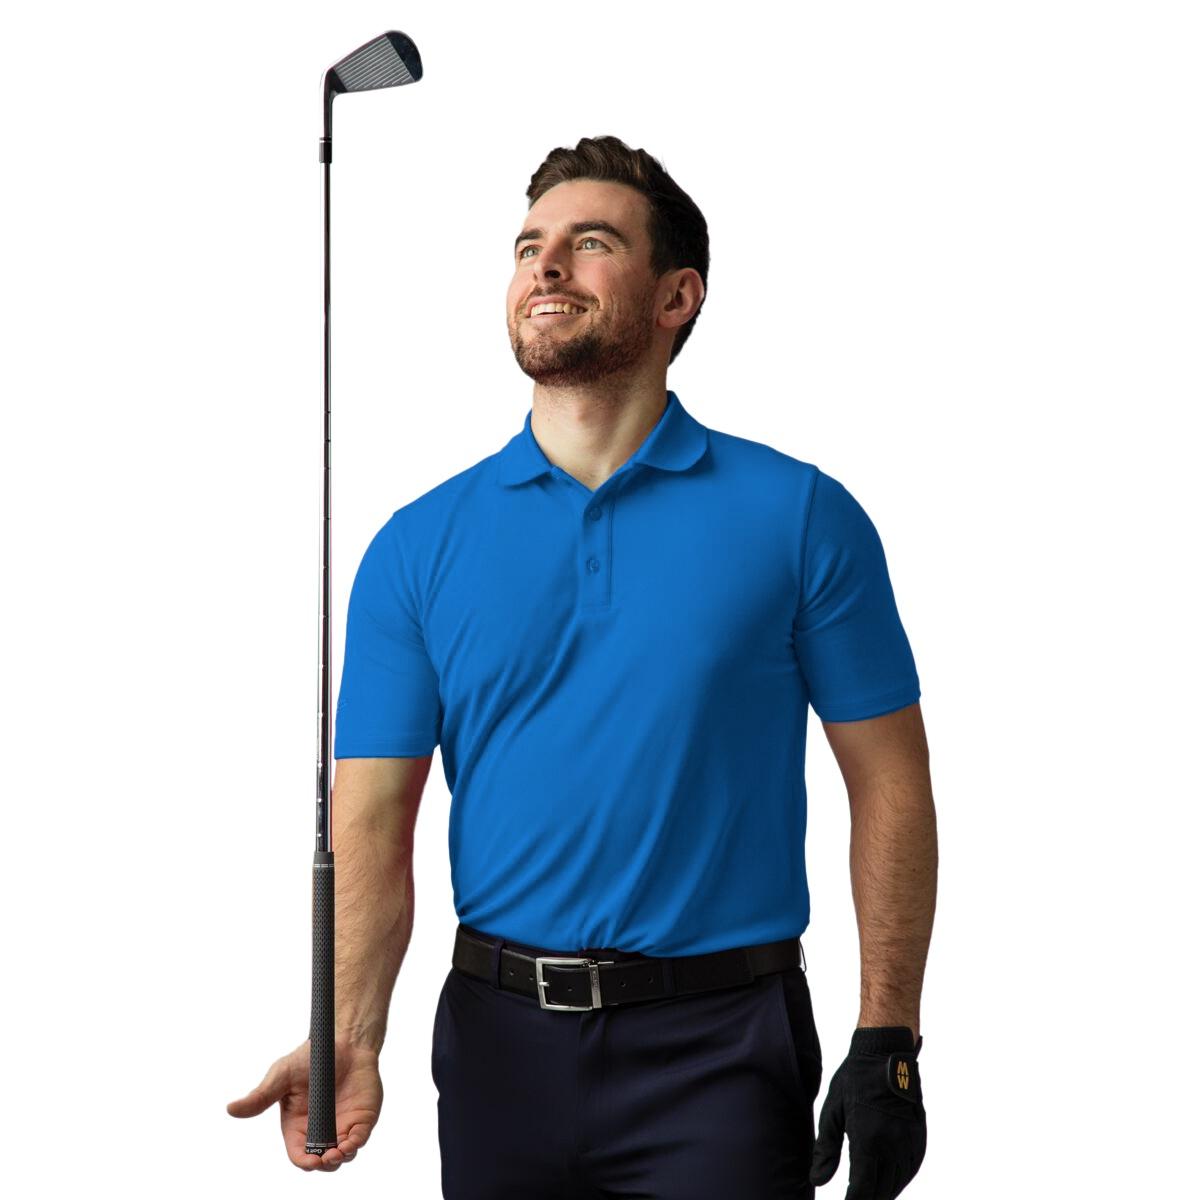 Glenmuir Mens Plain Performance Pique Short Sleeve Golf Polo Shirt (L) (Black)